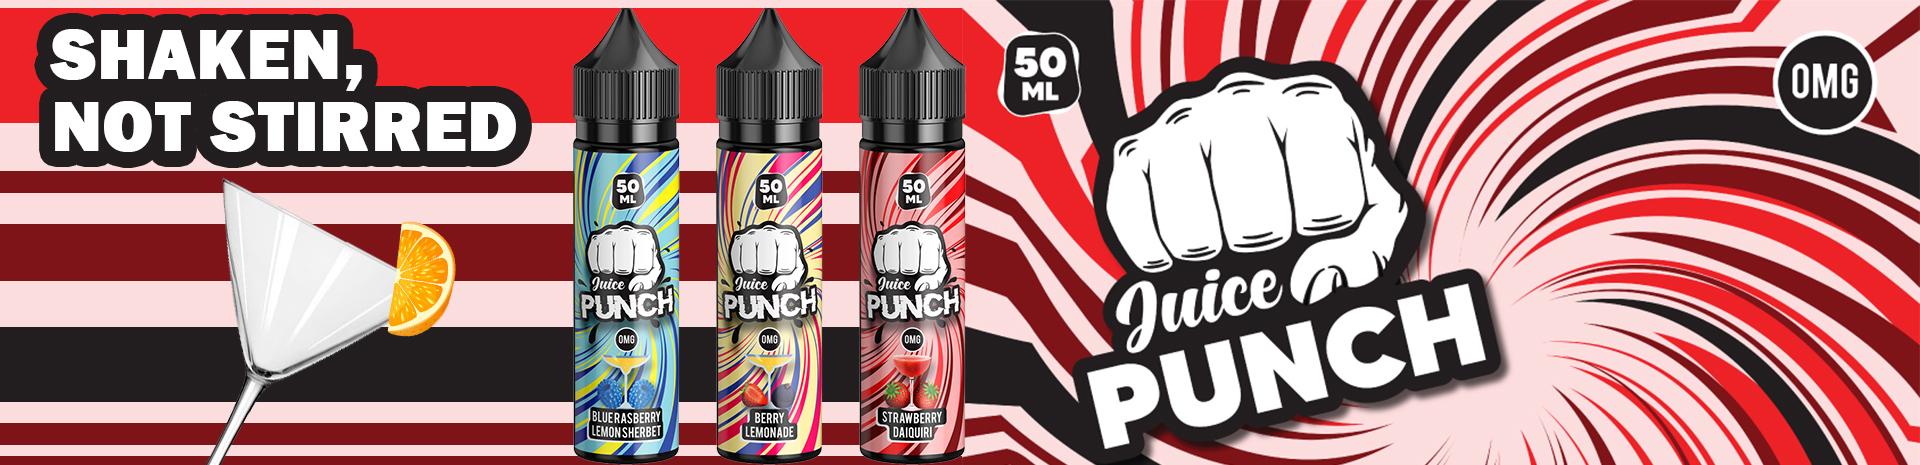 juice punch banner